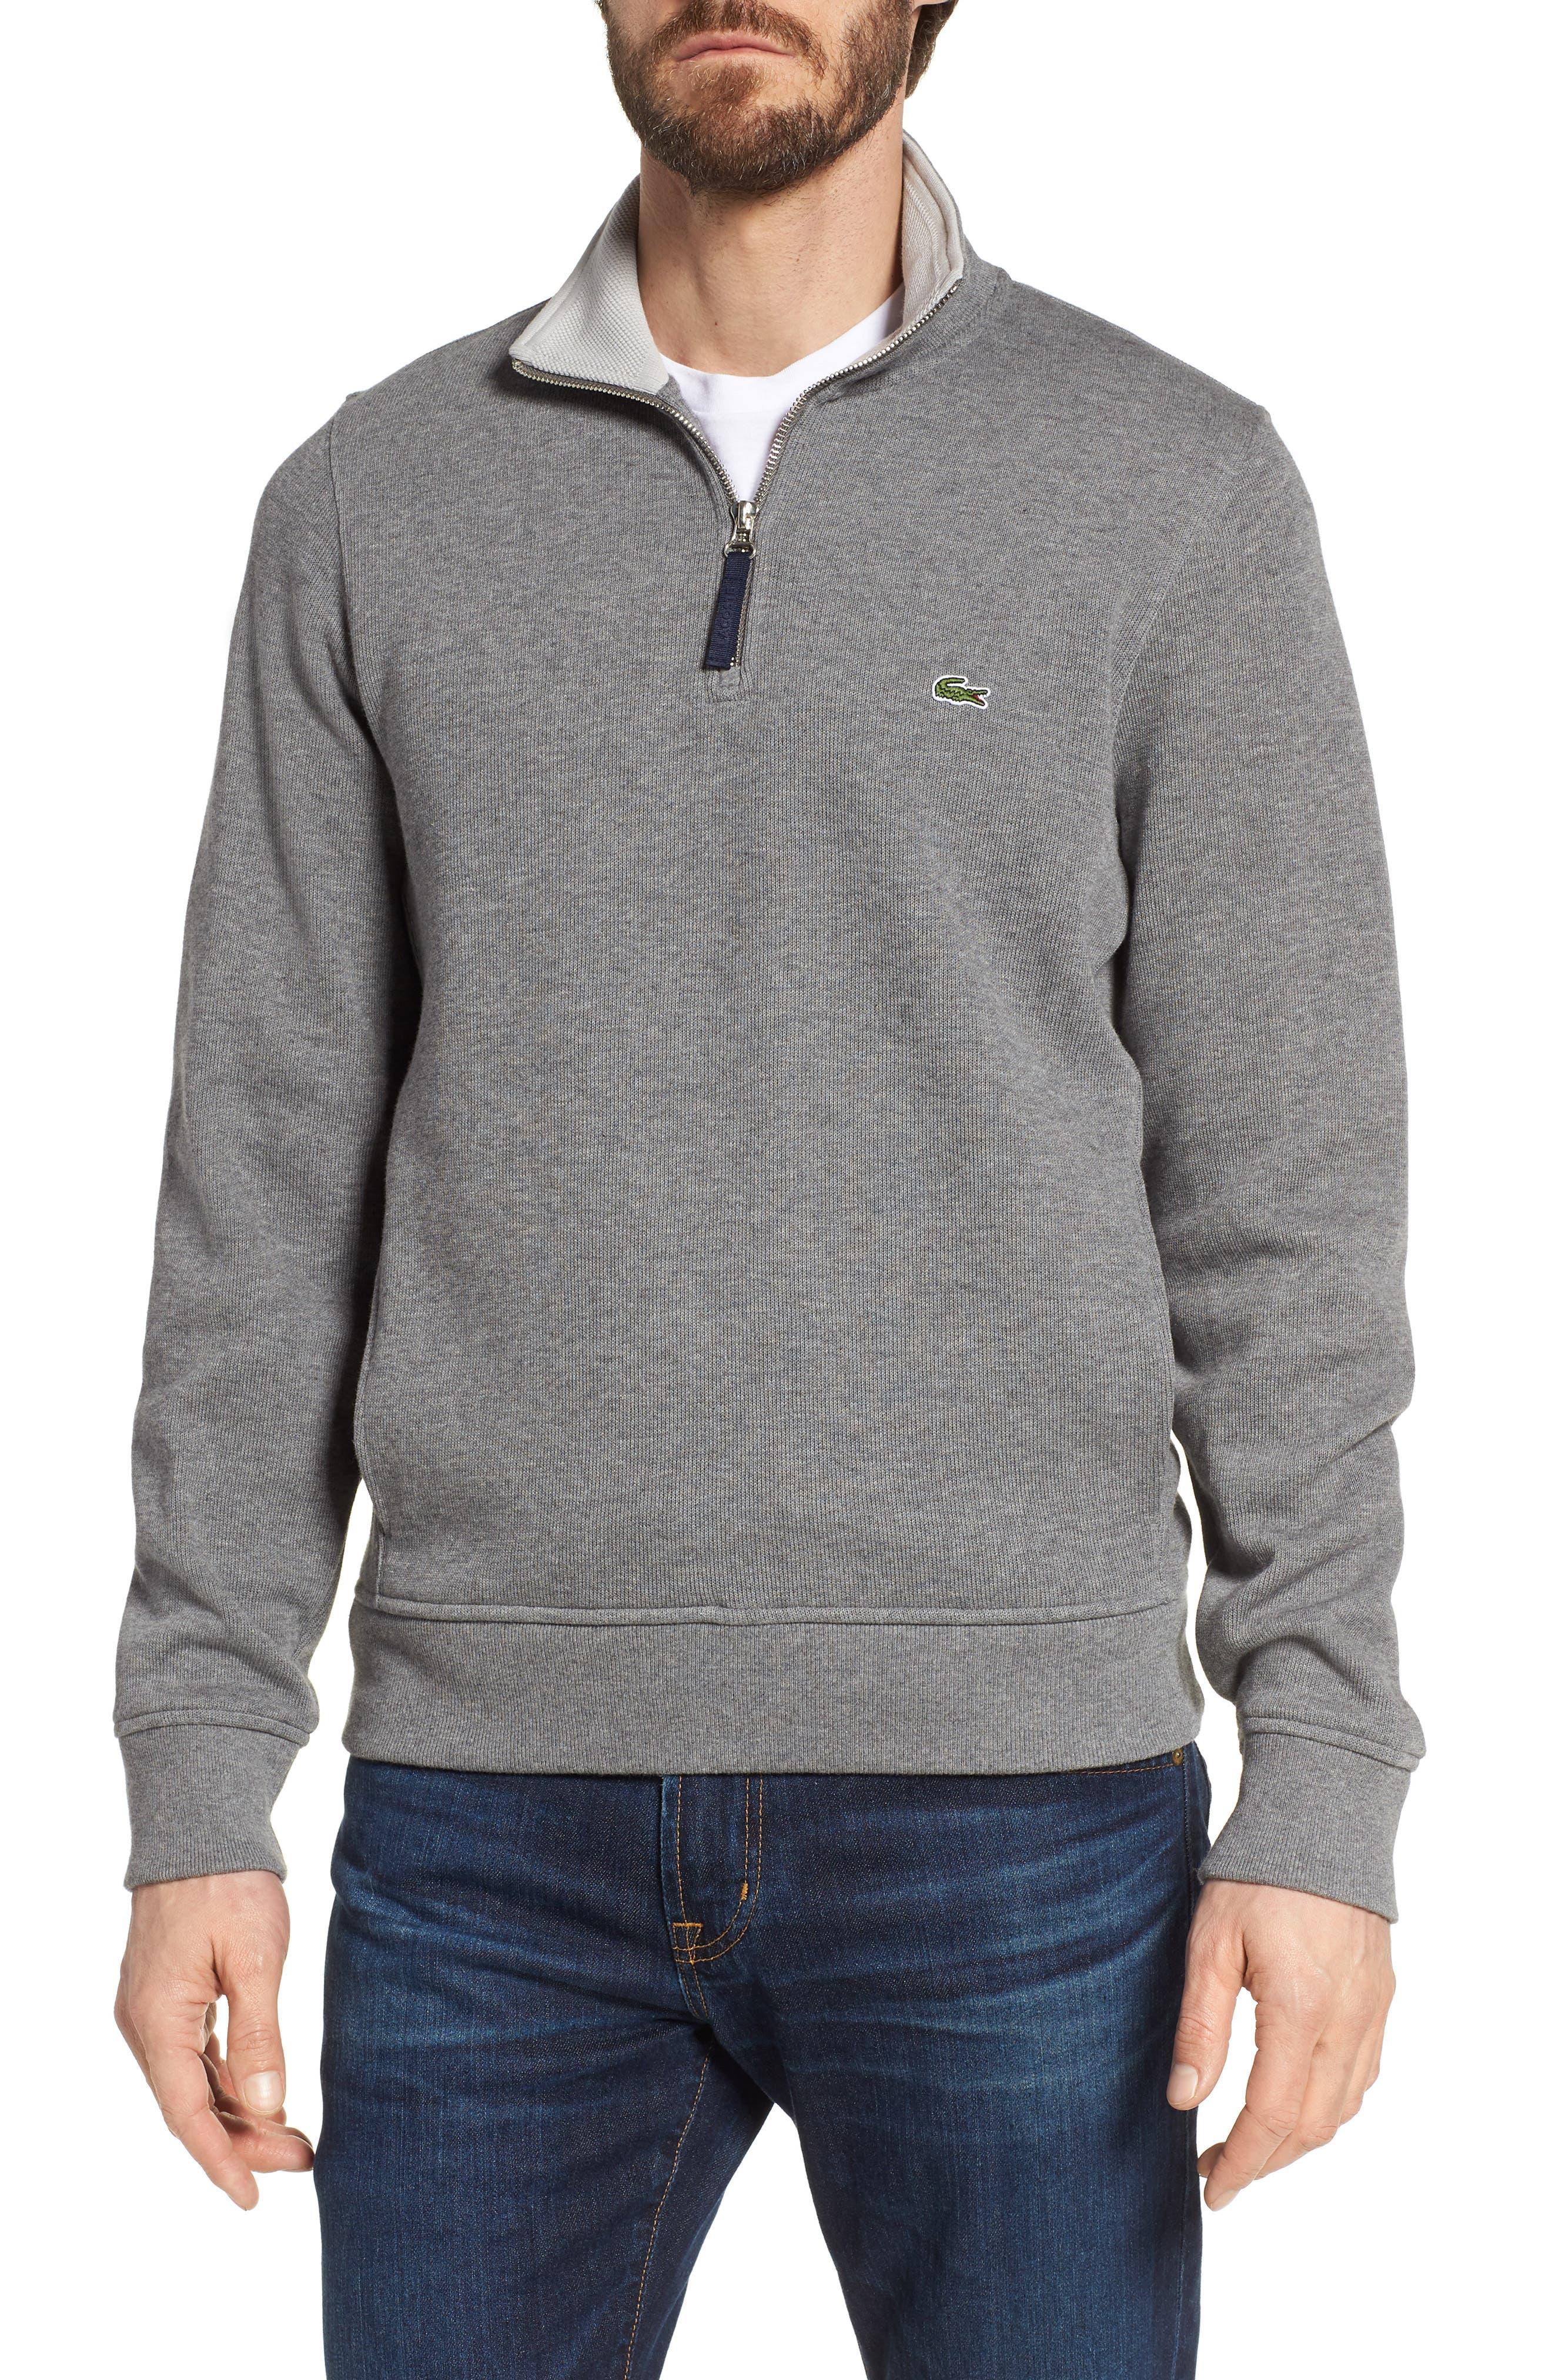 Quarter Zip Cotton Interlock Sweatshirt,                             Main thumbnail 1, color,                             GALAXITE CHINE/ NIMBUS